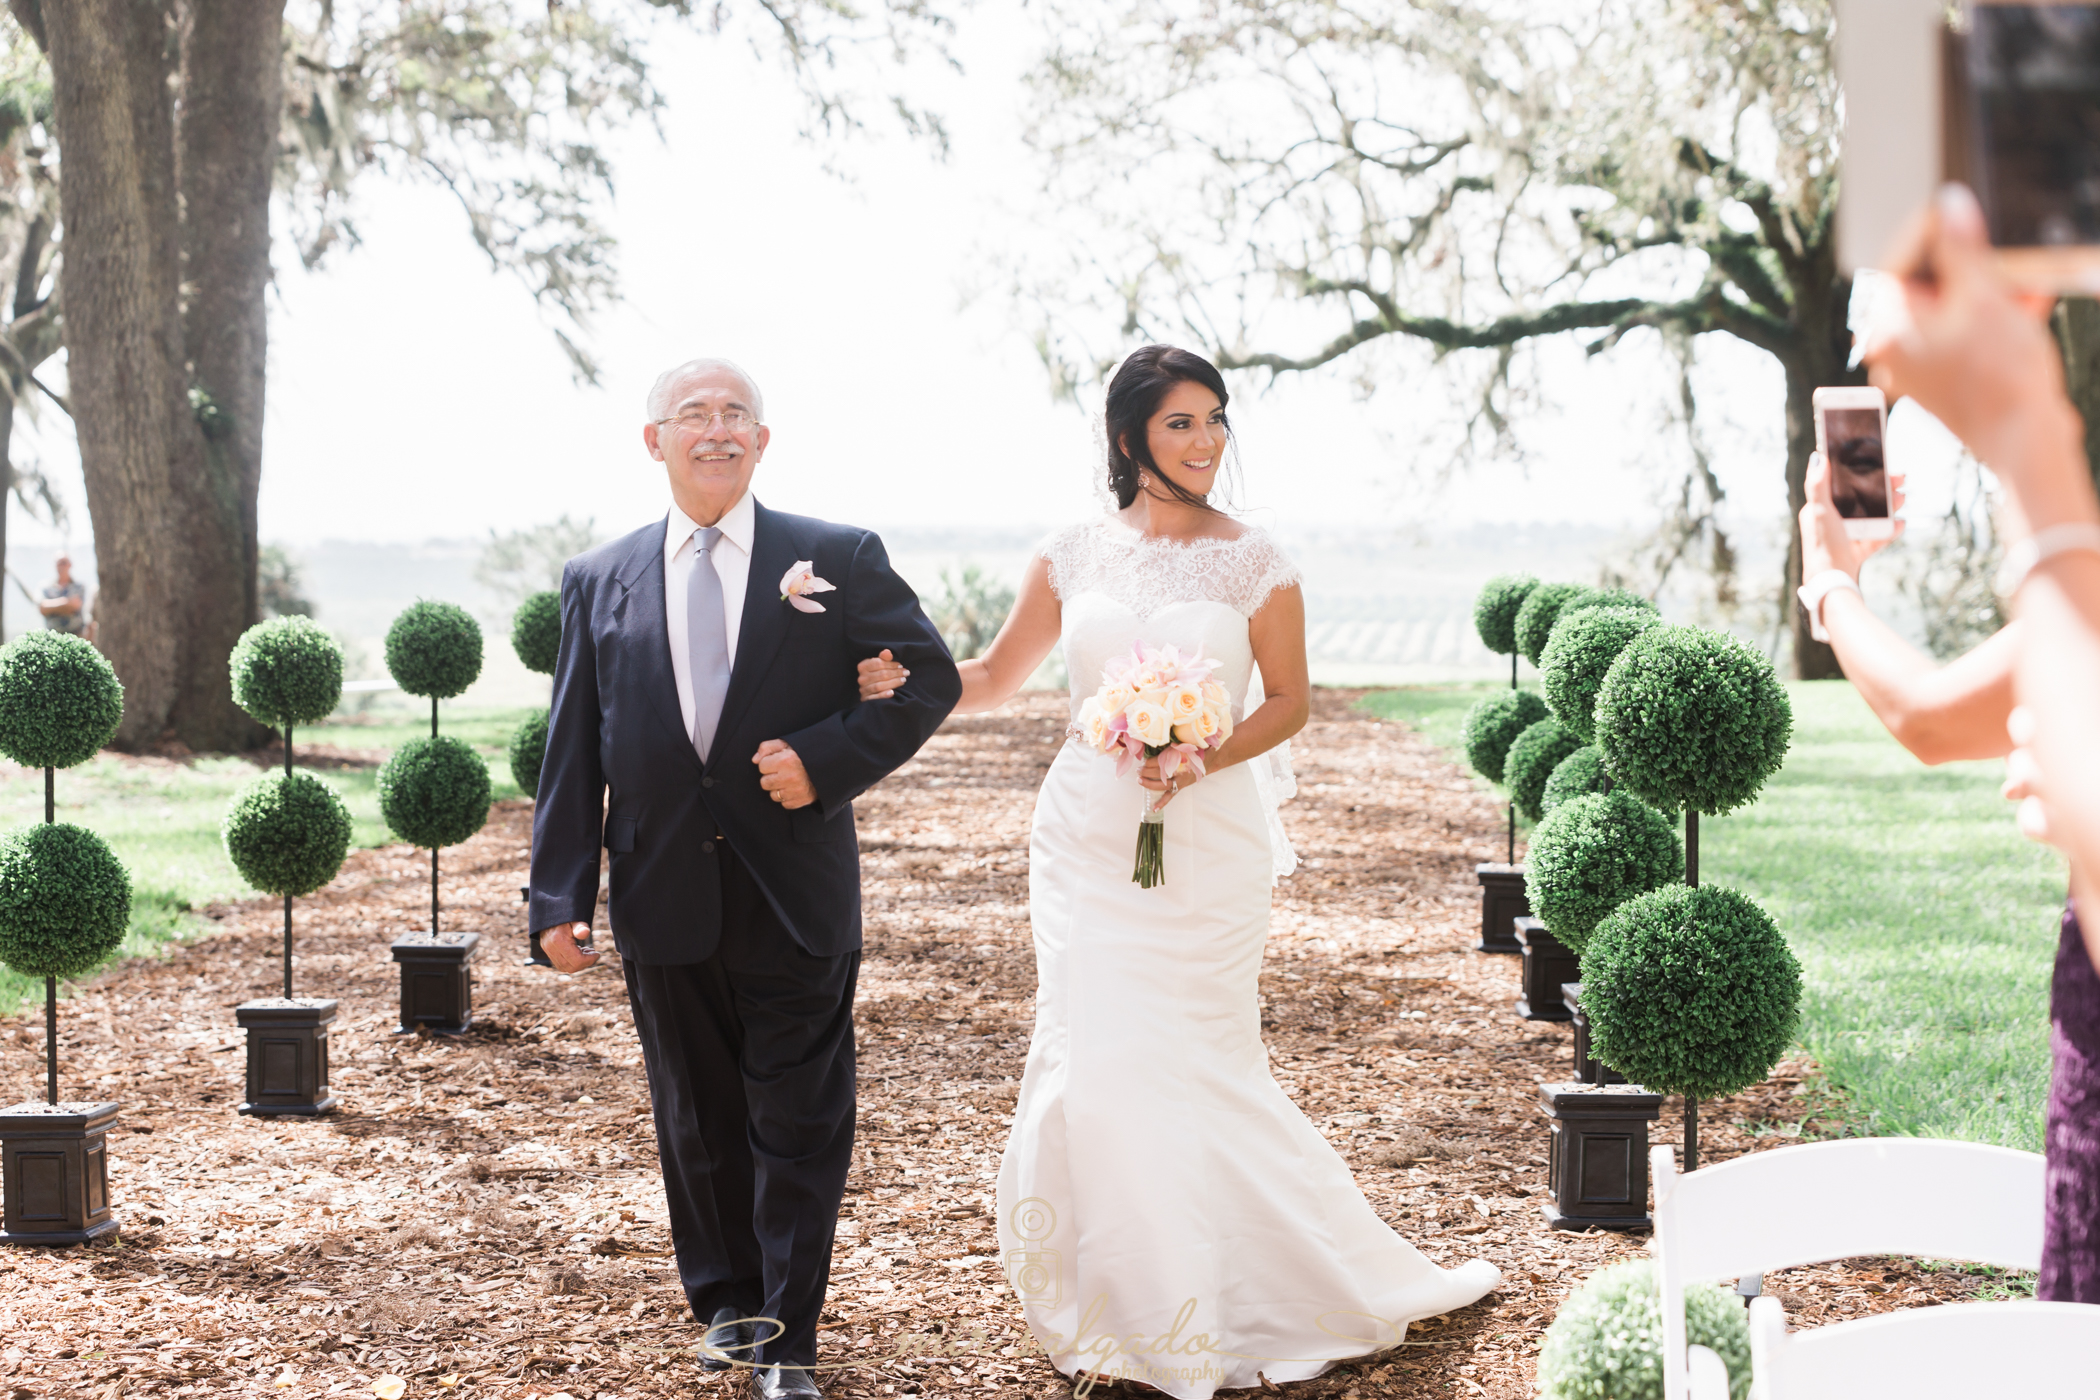 Bok-tower-gardens-wedding-ceremony-photo, Tampa-photographer